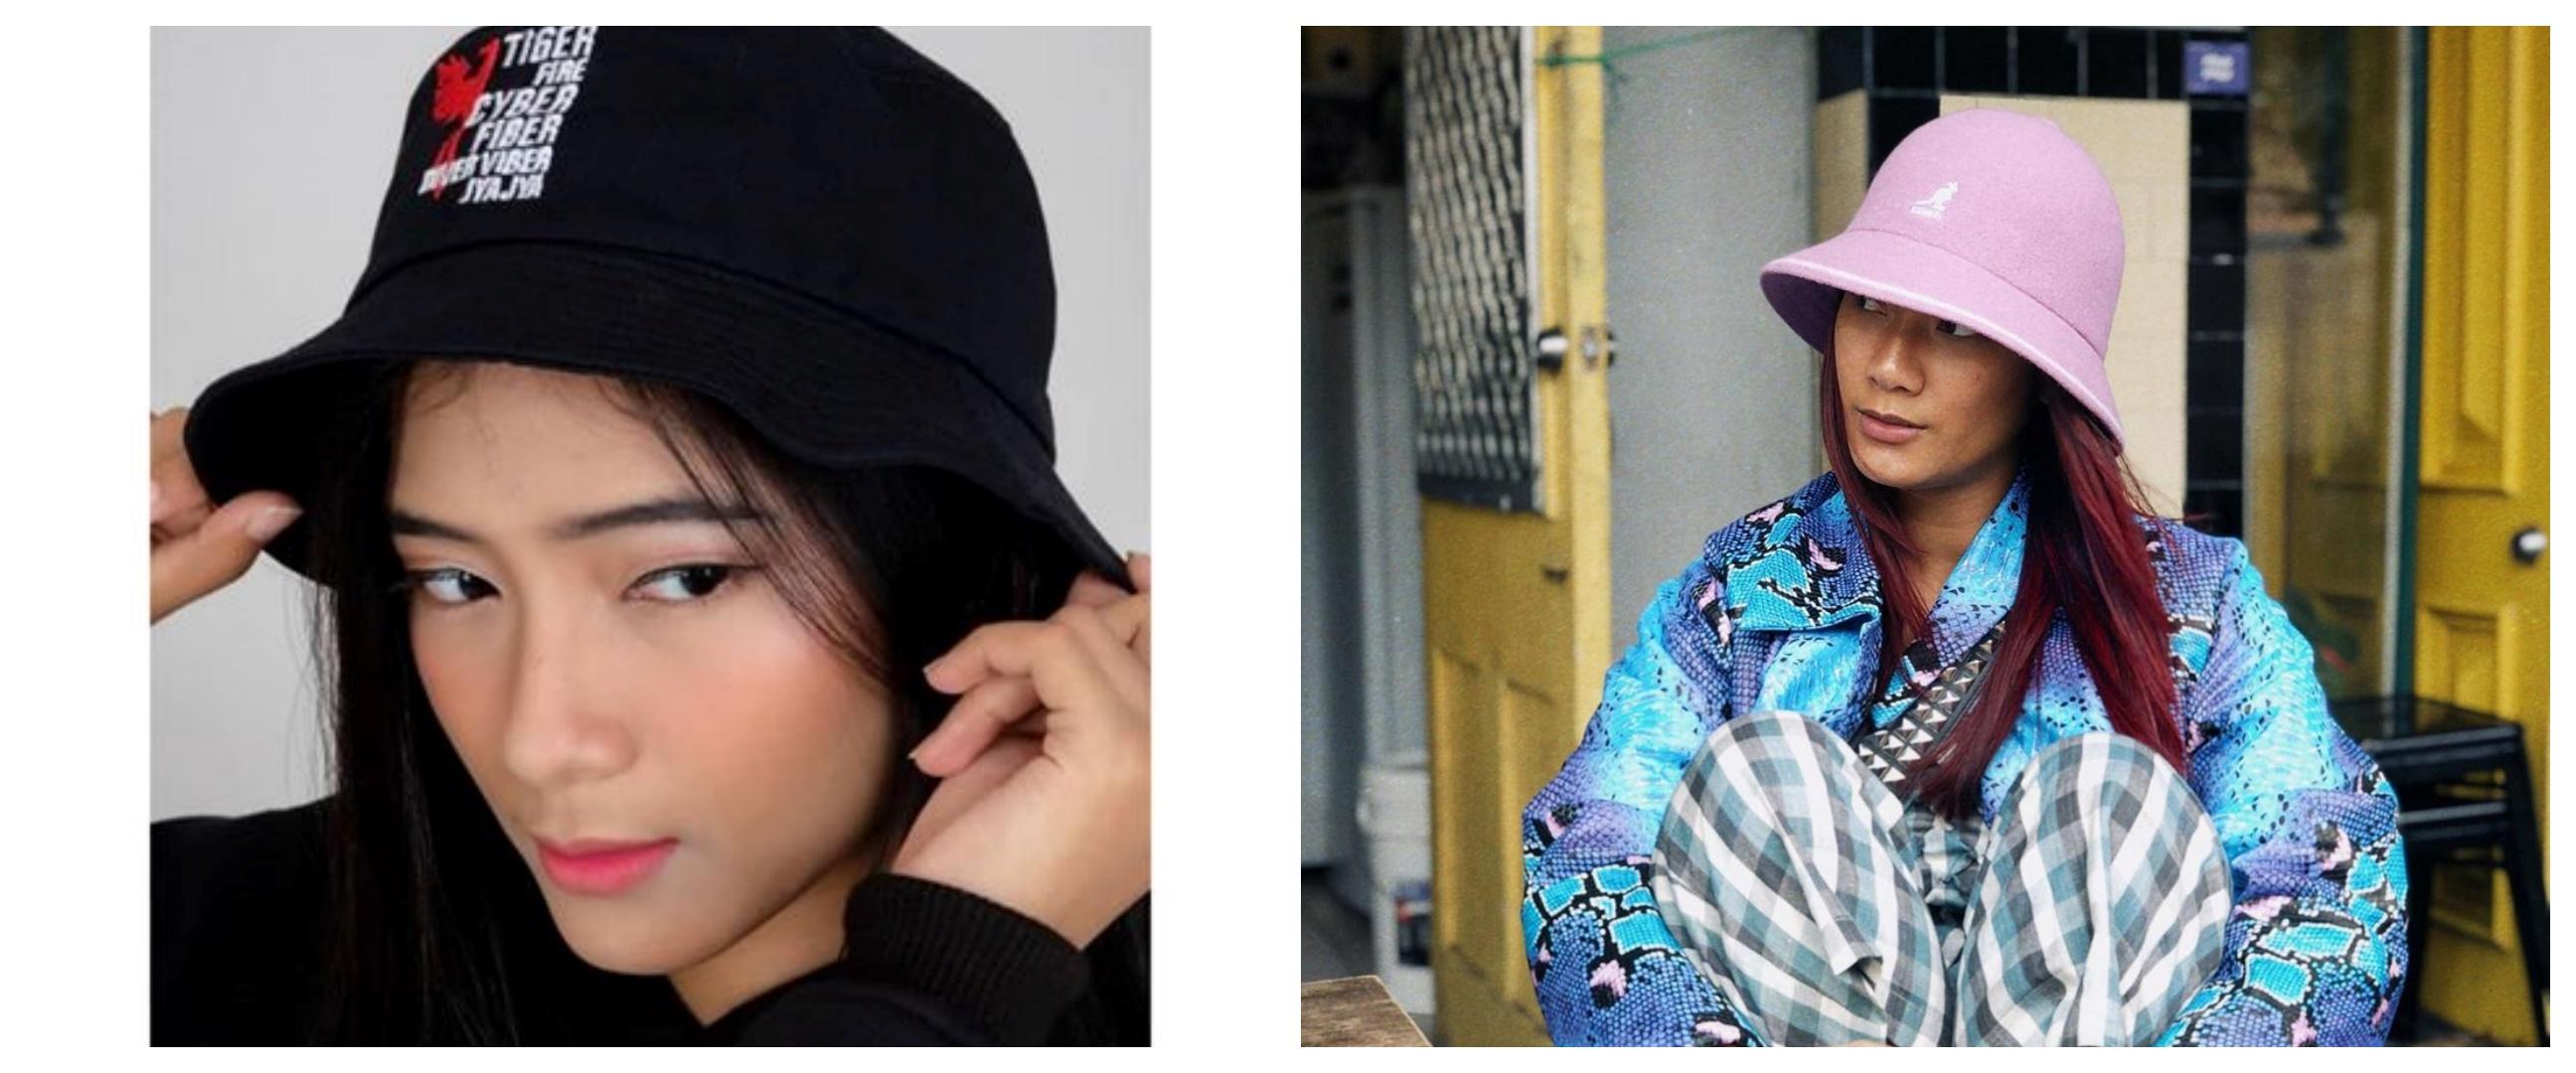 Disebut mirip Tara Basro, ini 10 potret Jinan JKT48 nan memesona